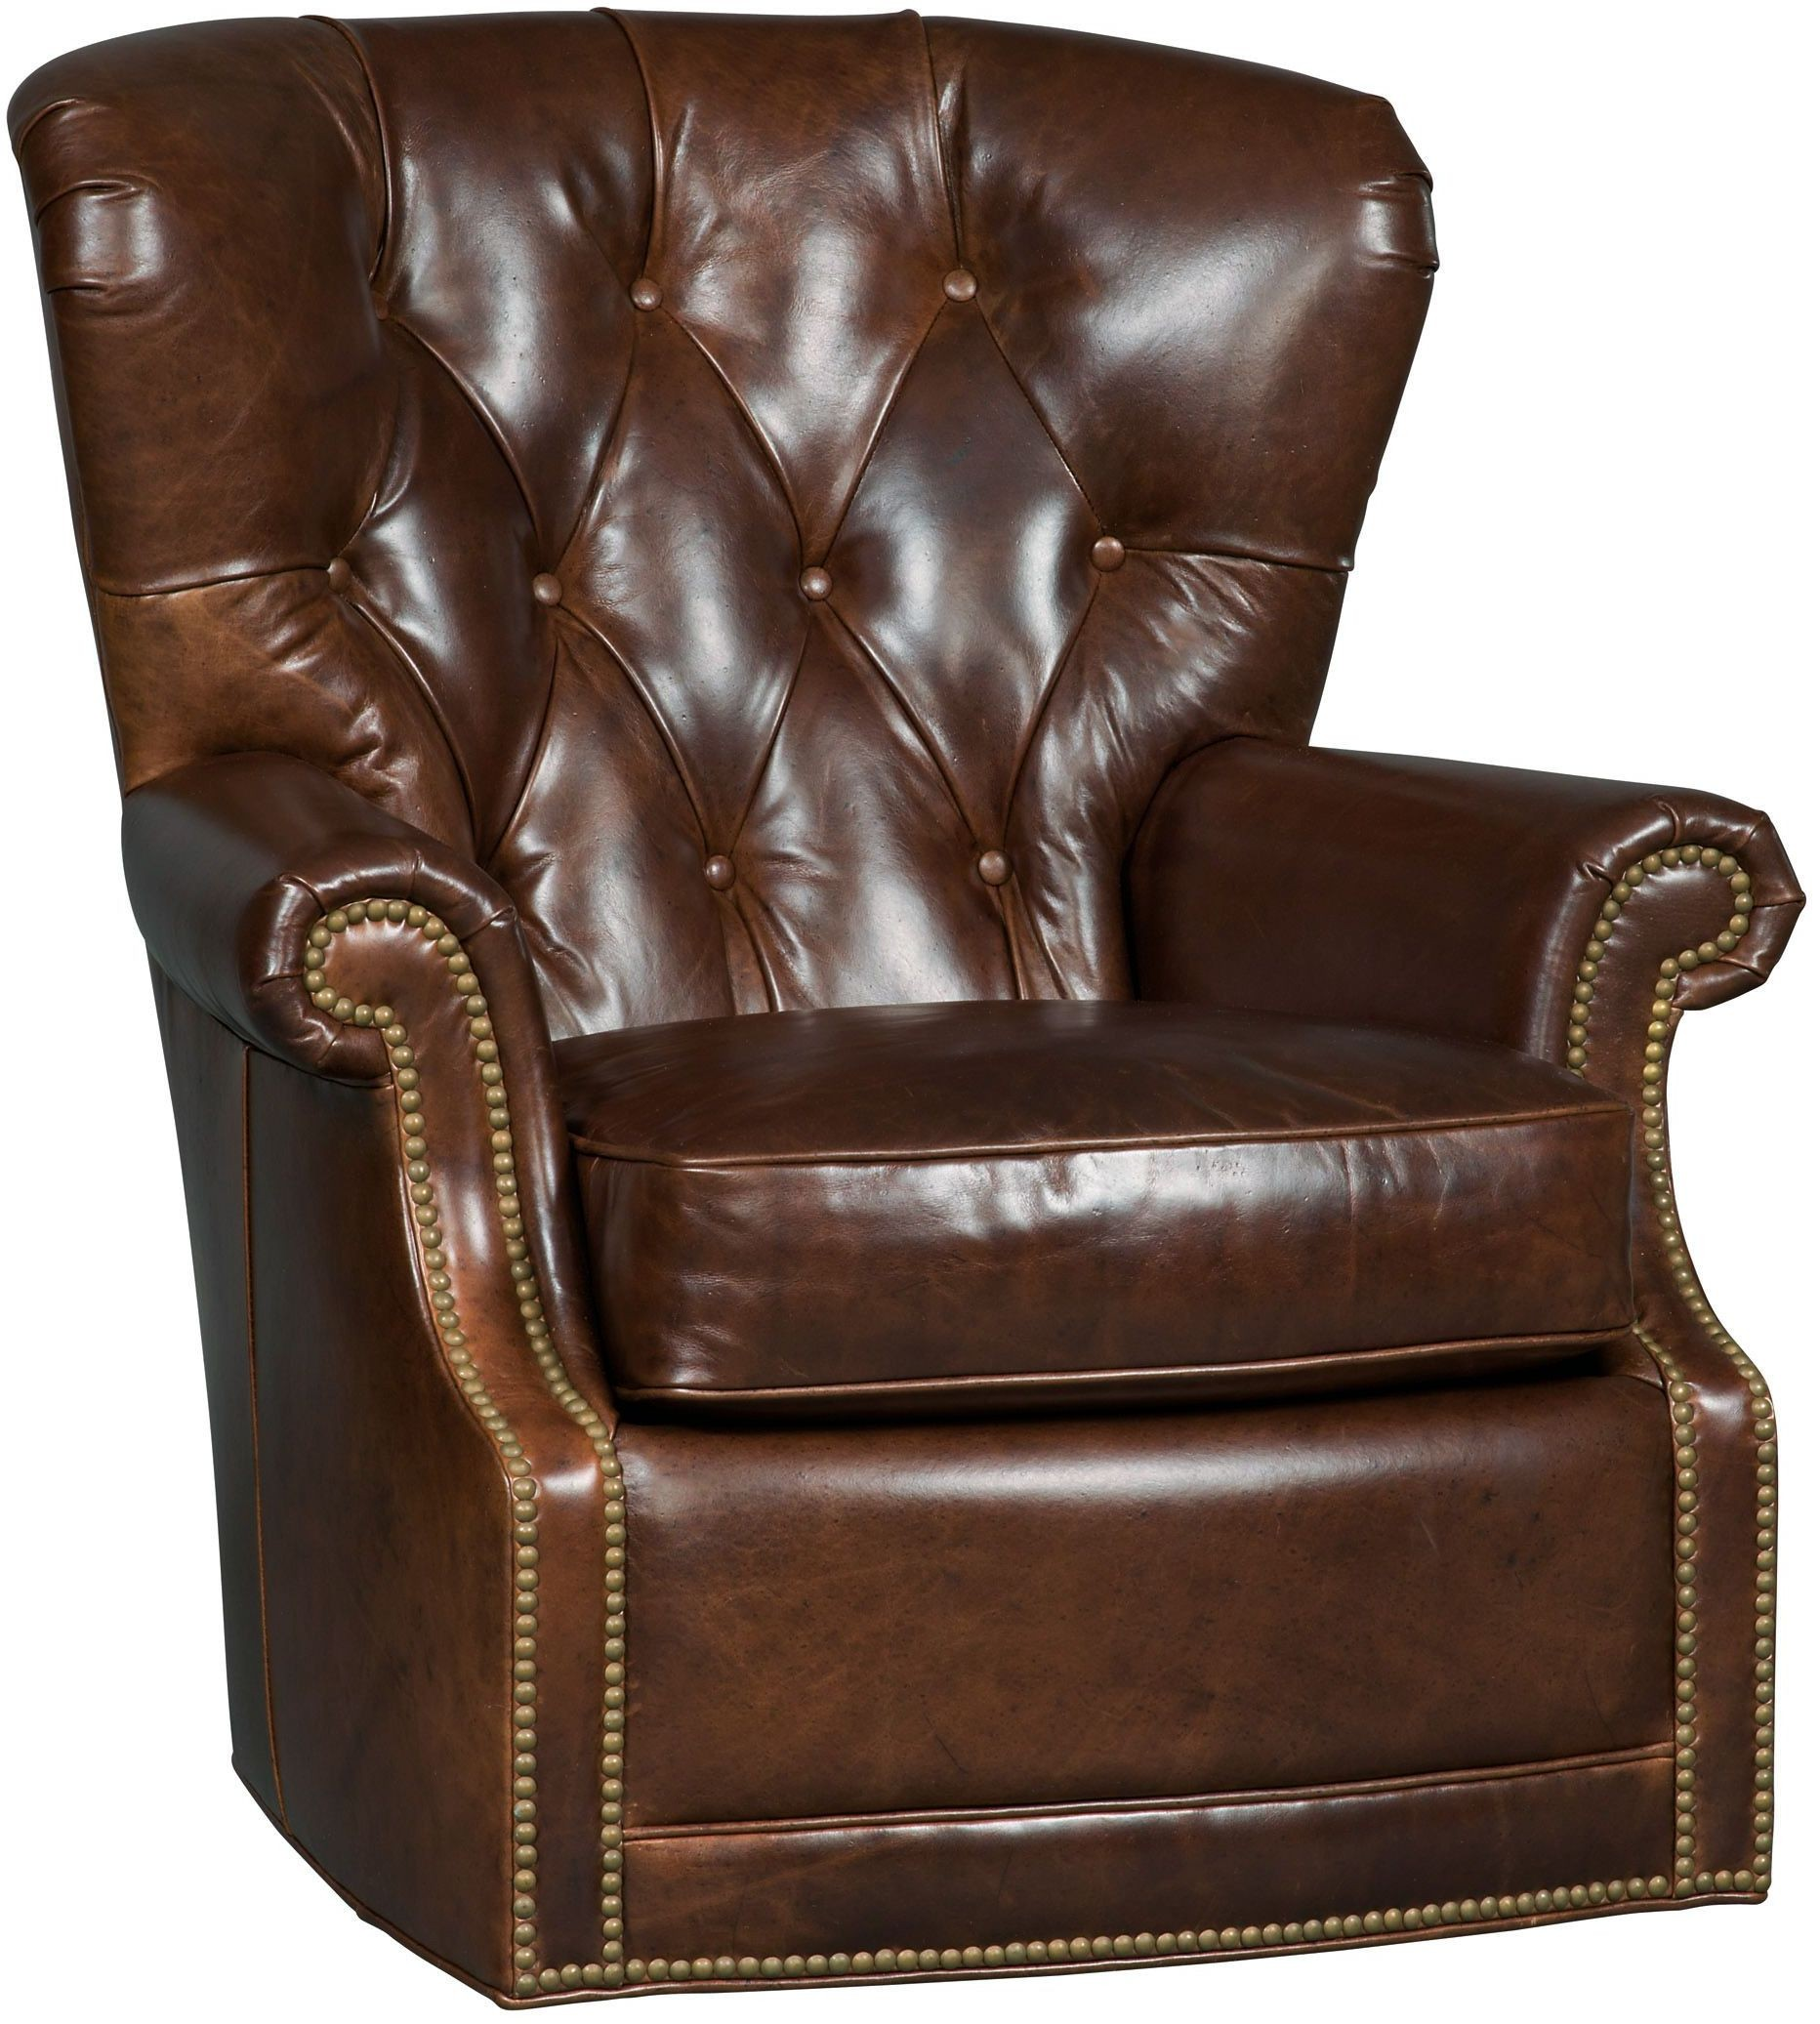 swivel chair brown baby beach chairs simon ss304 sw 087 hooker furniture